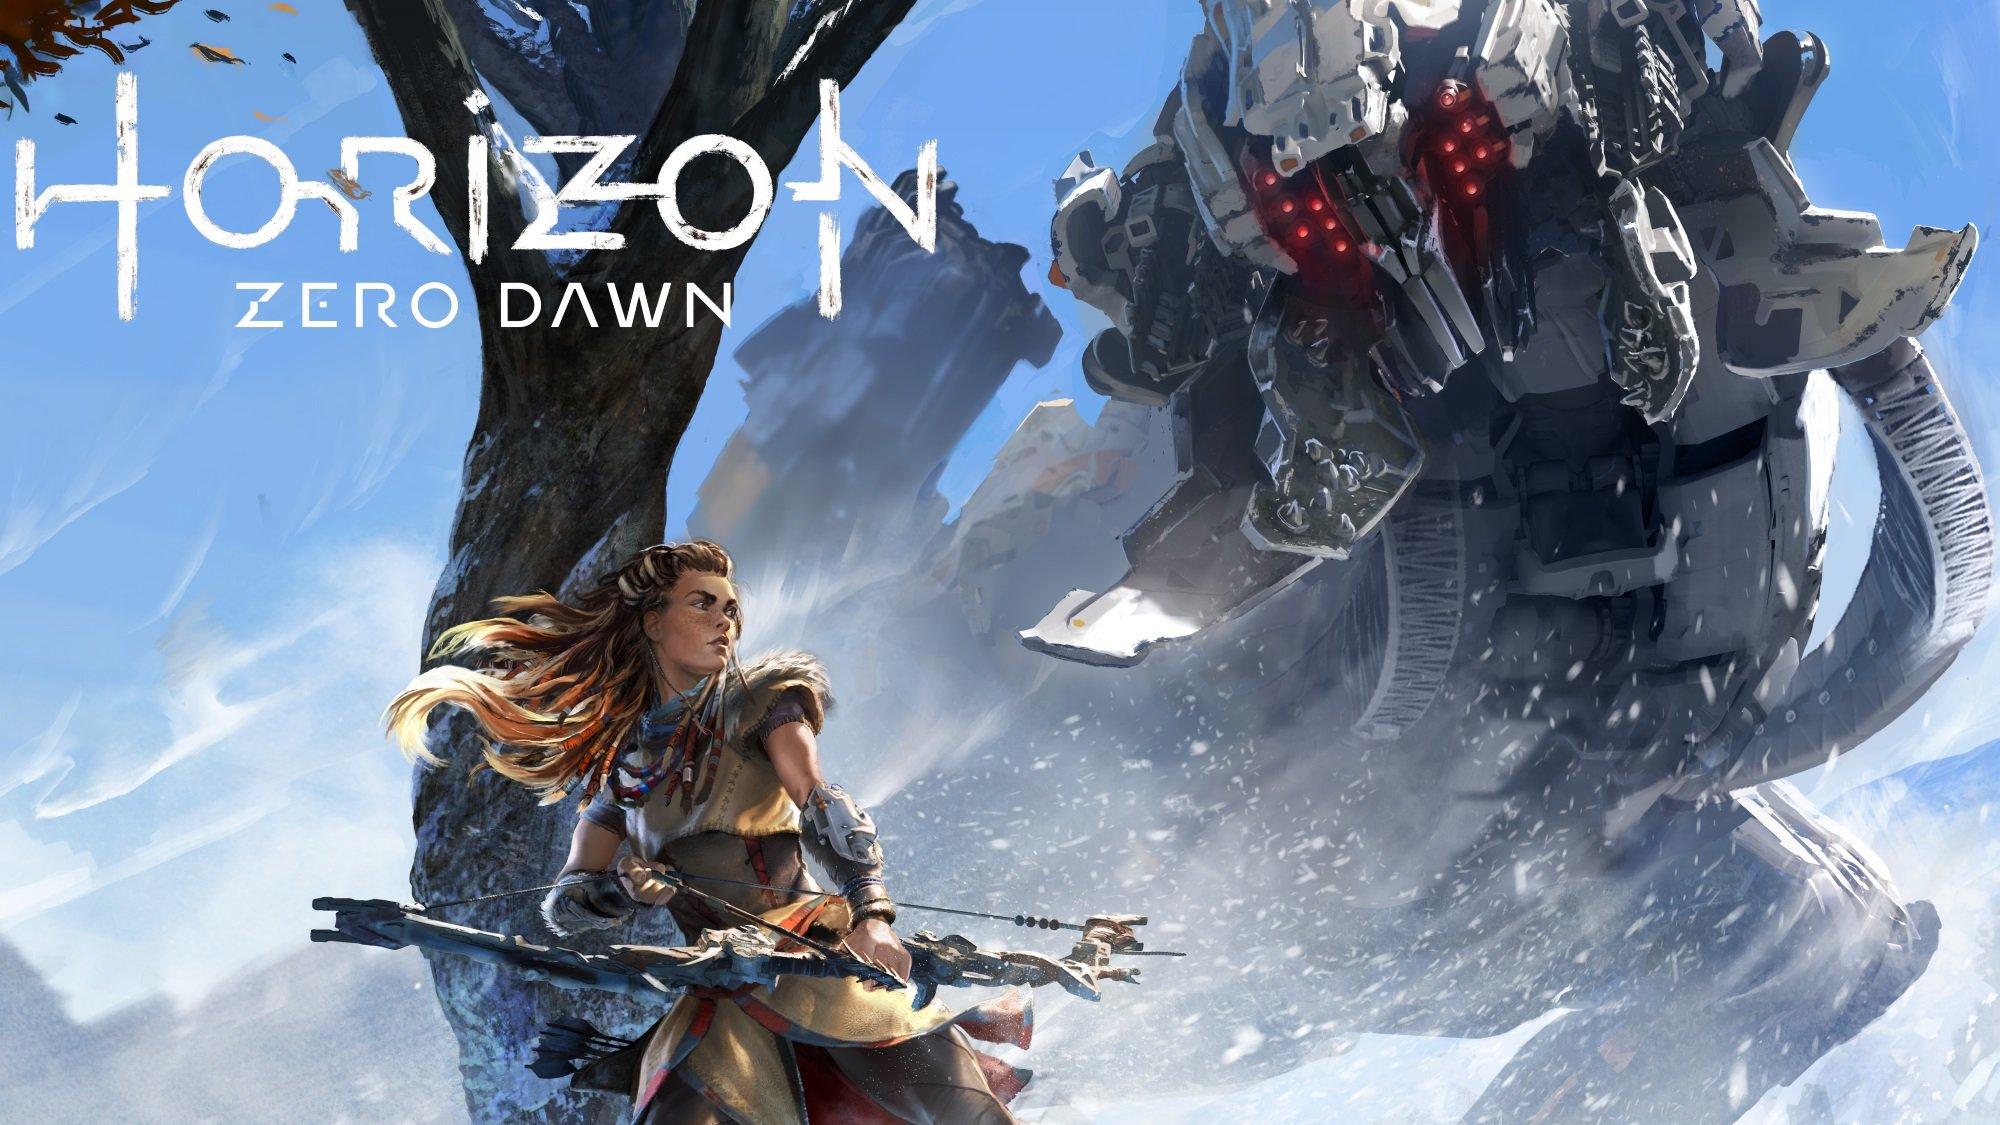 Free Download Horizon Zero Dawn Wallpaper 2000x1125 For Your